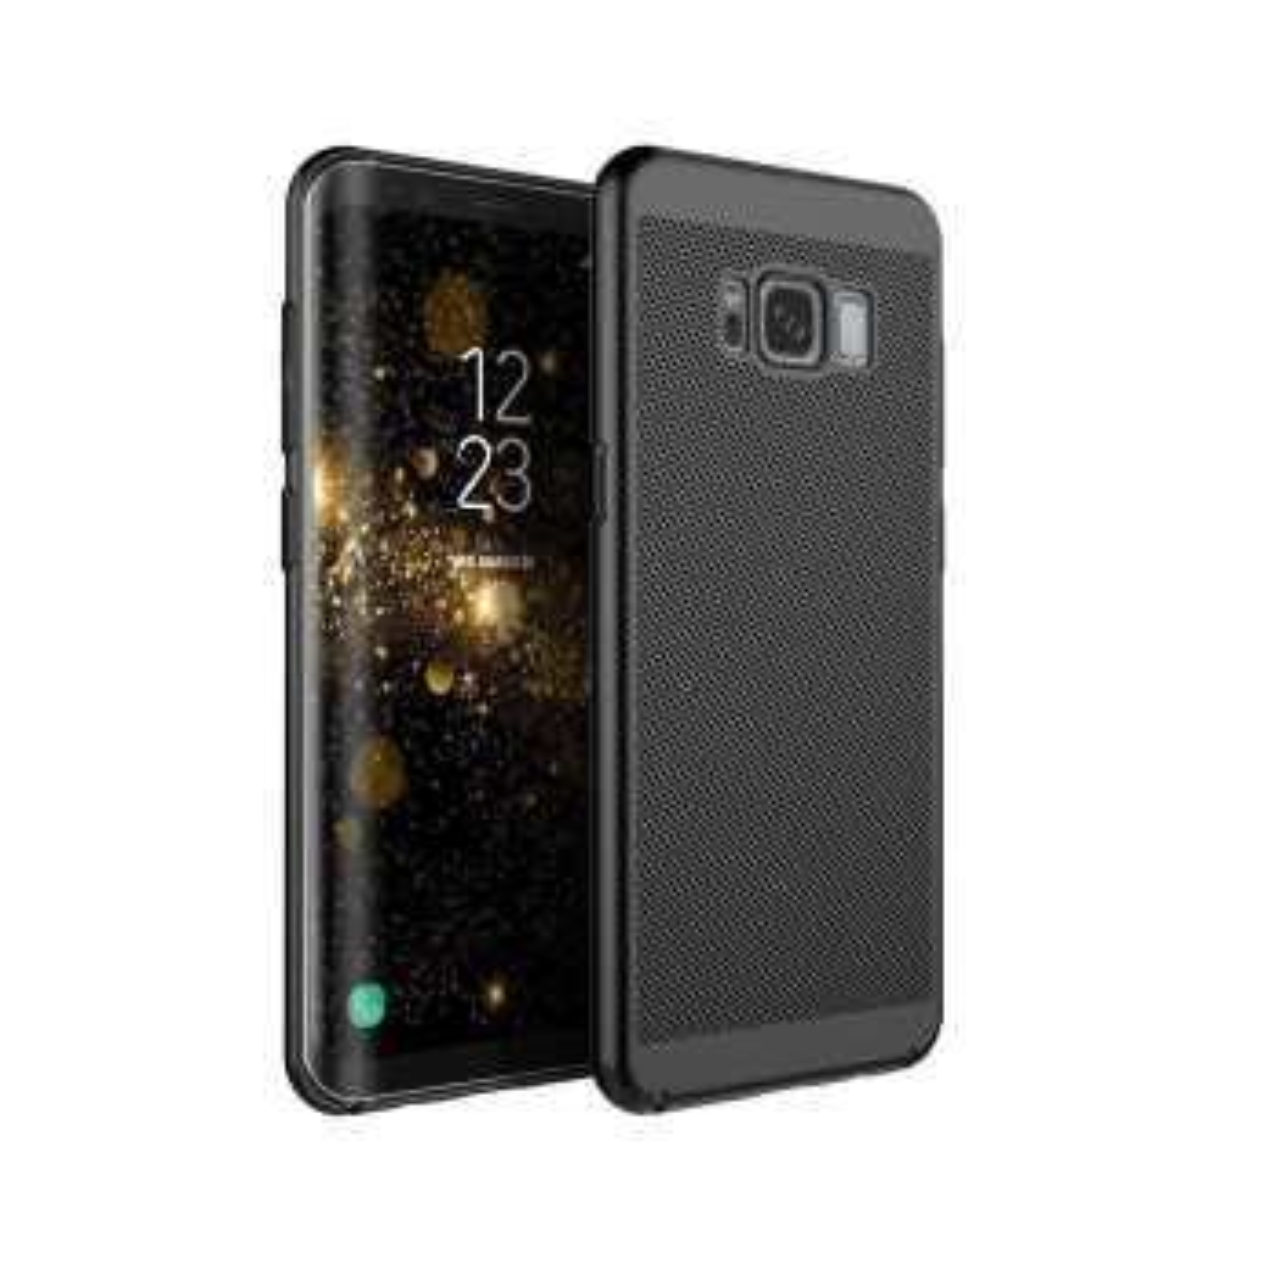 کاور آیپکی مدل Hard Mesh مناسب برای گوشی Samsung Galaxy S8